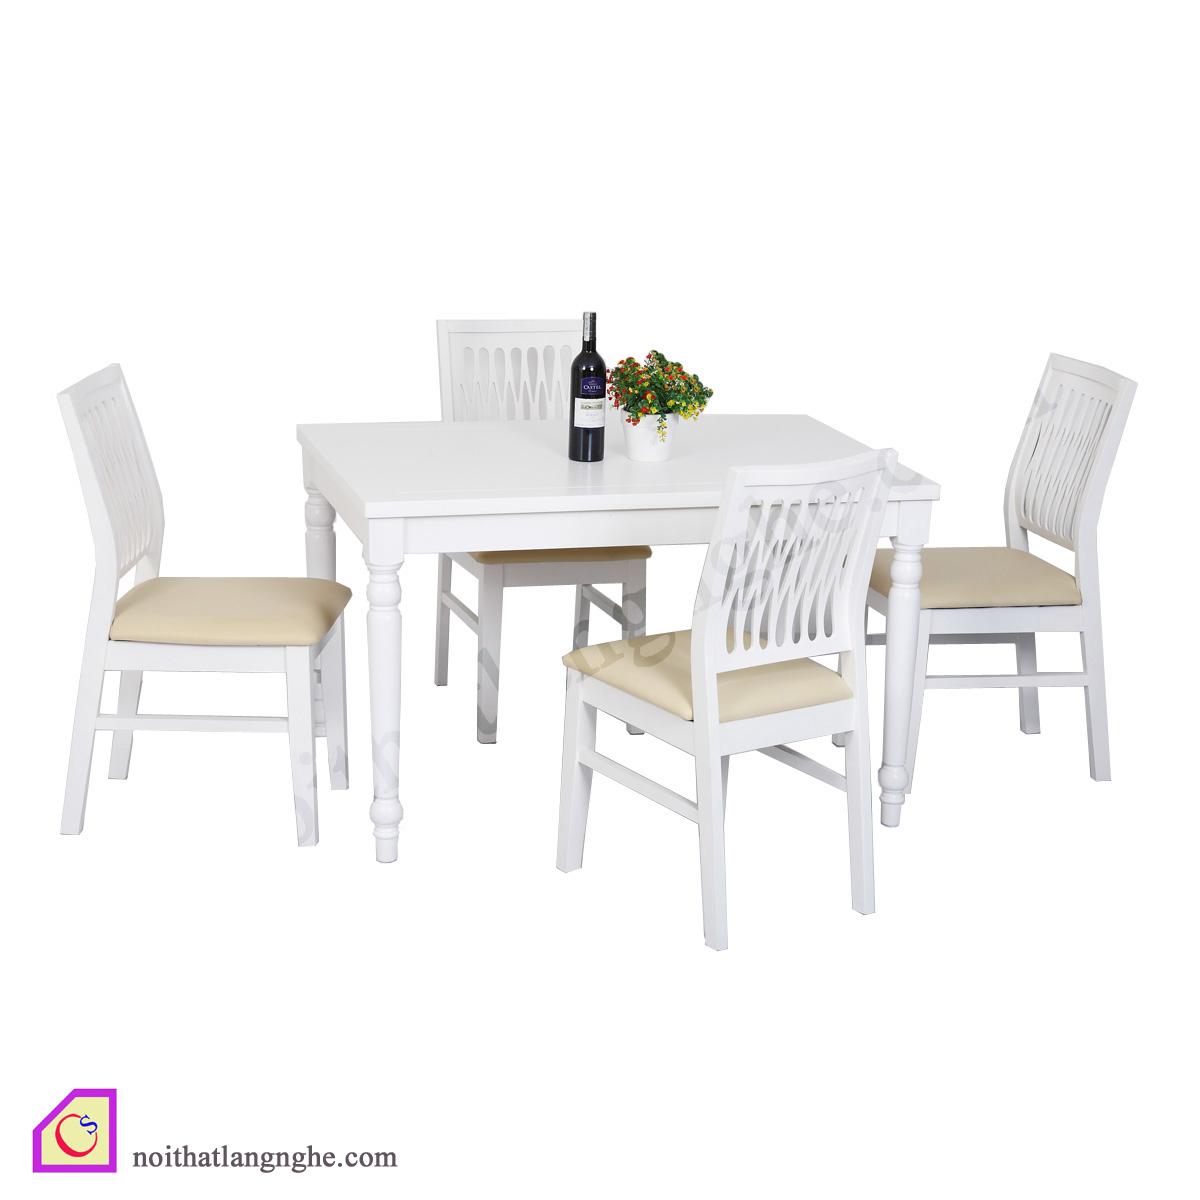 Bộ bàn ghế ăn 4 ghế BGA_03